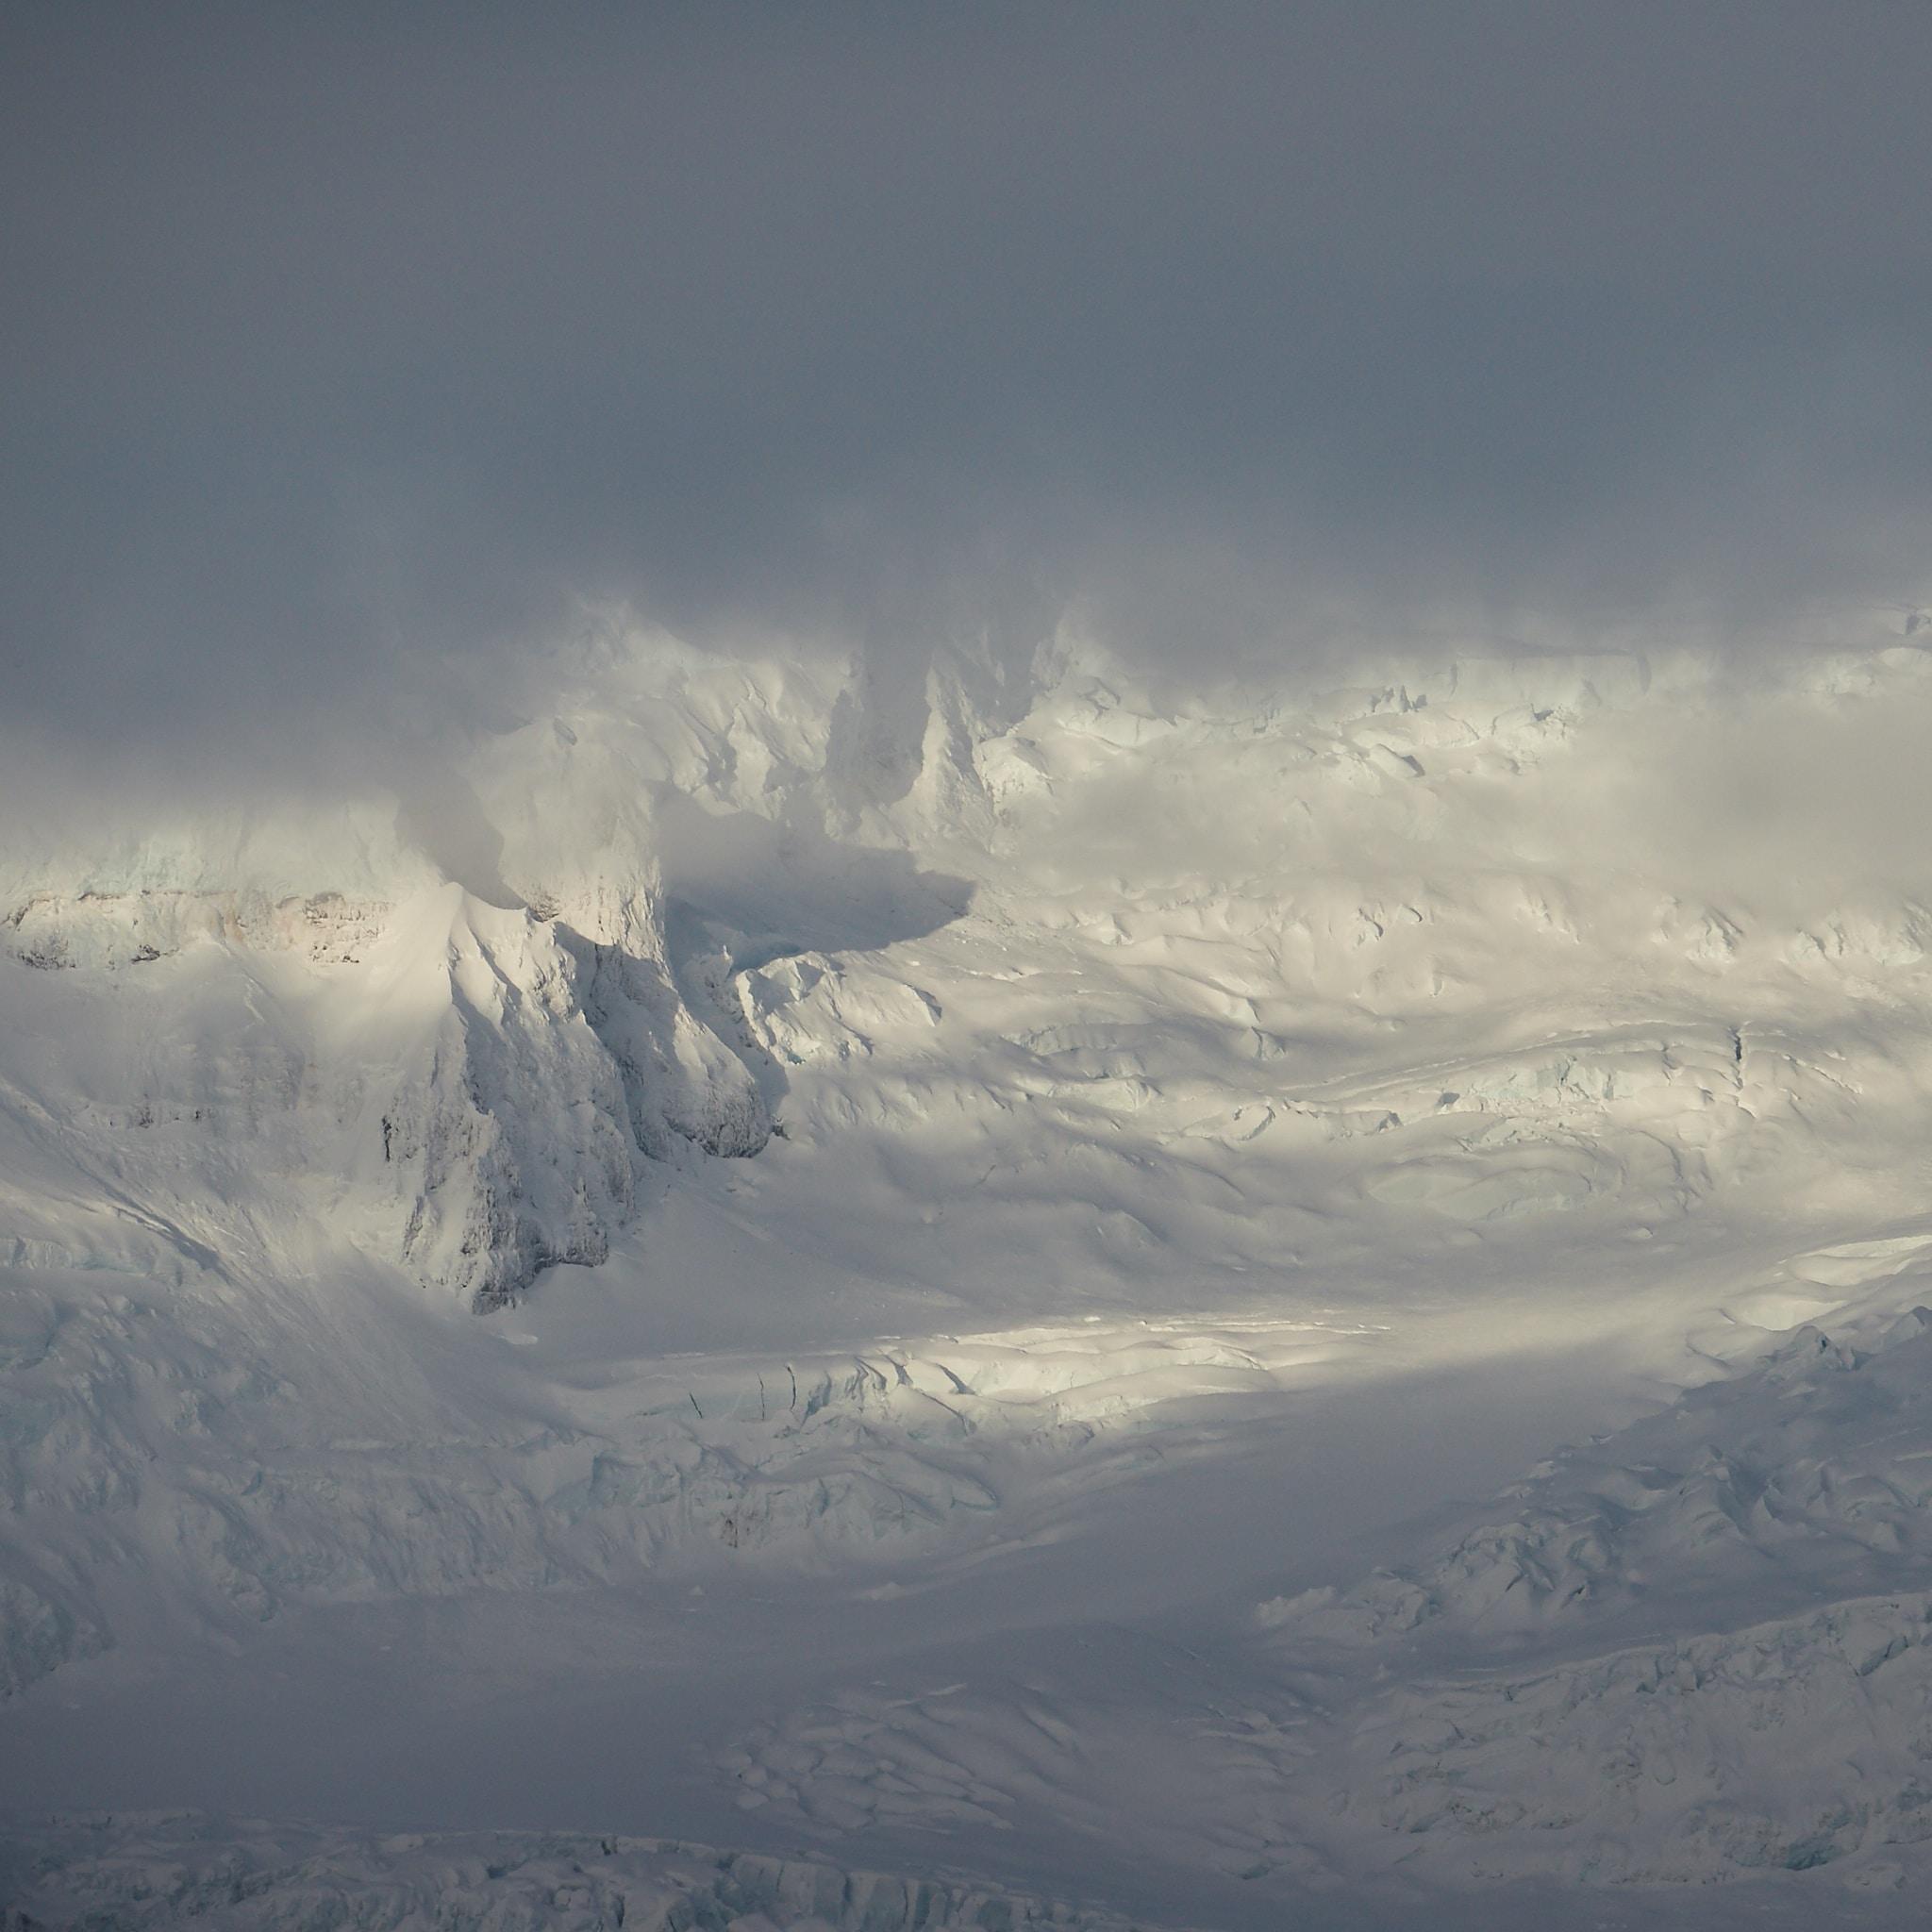 glacier mountains